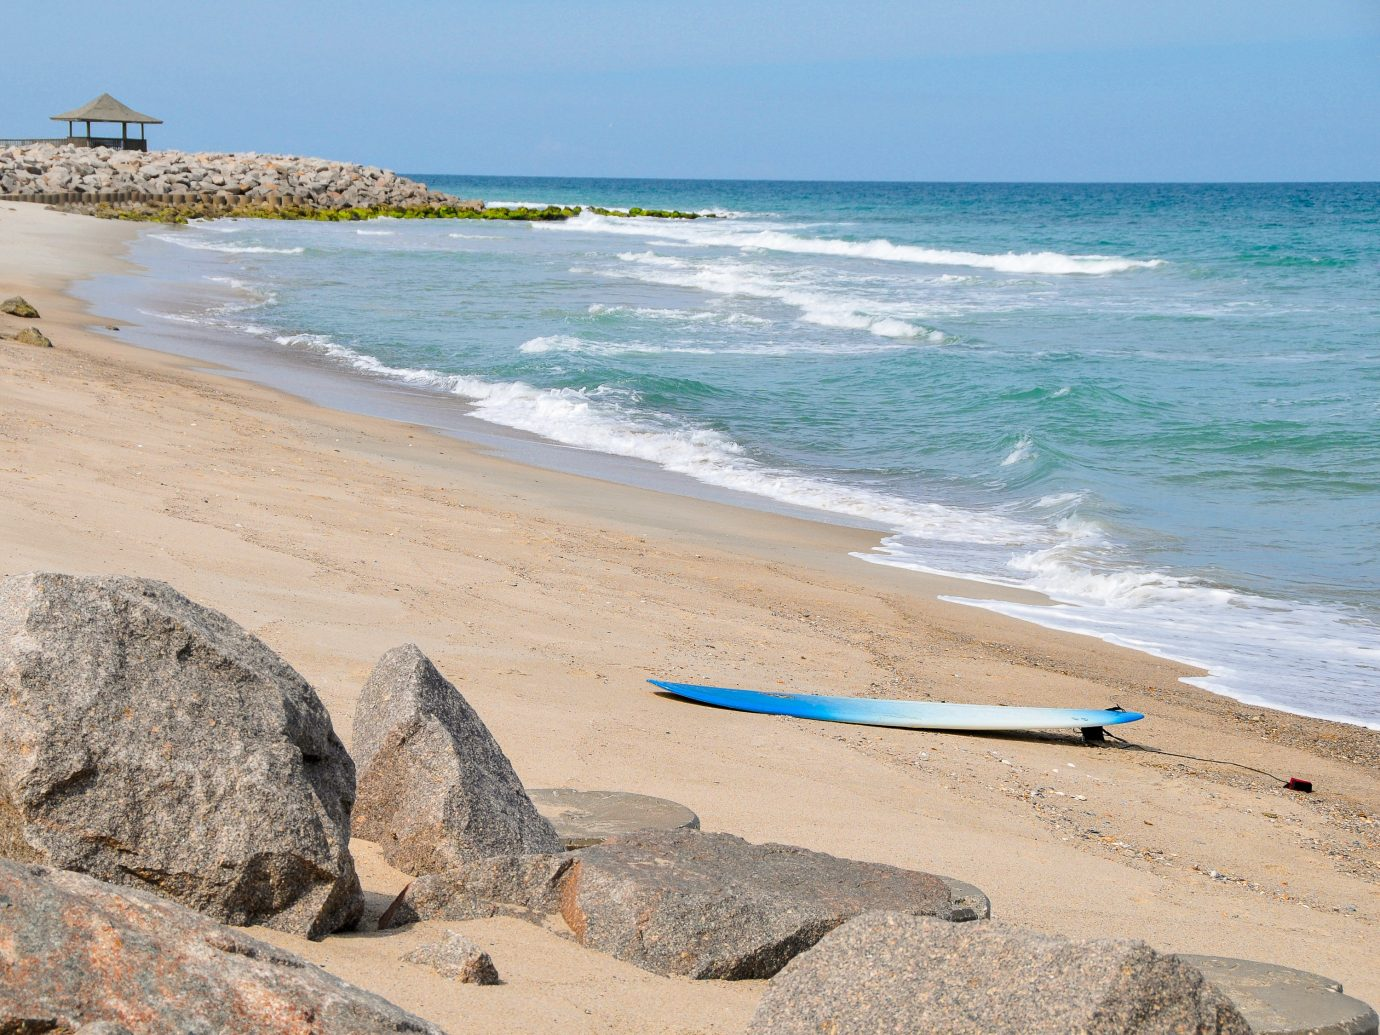 East Coast USA Trip Ideas Beach Sea coastal and oceanic landforms Coast shore body of water Ocean sky sand wave vacation water wind wave bay tourism horizon